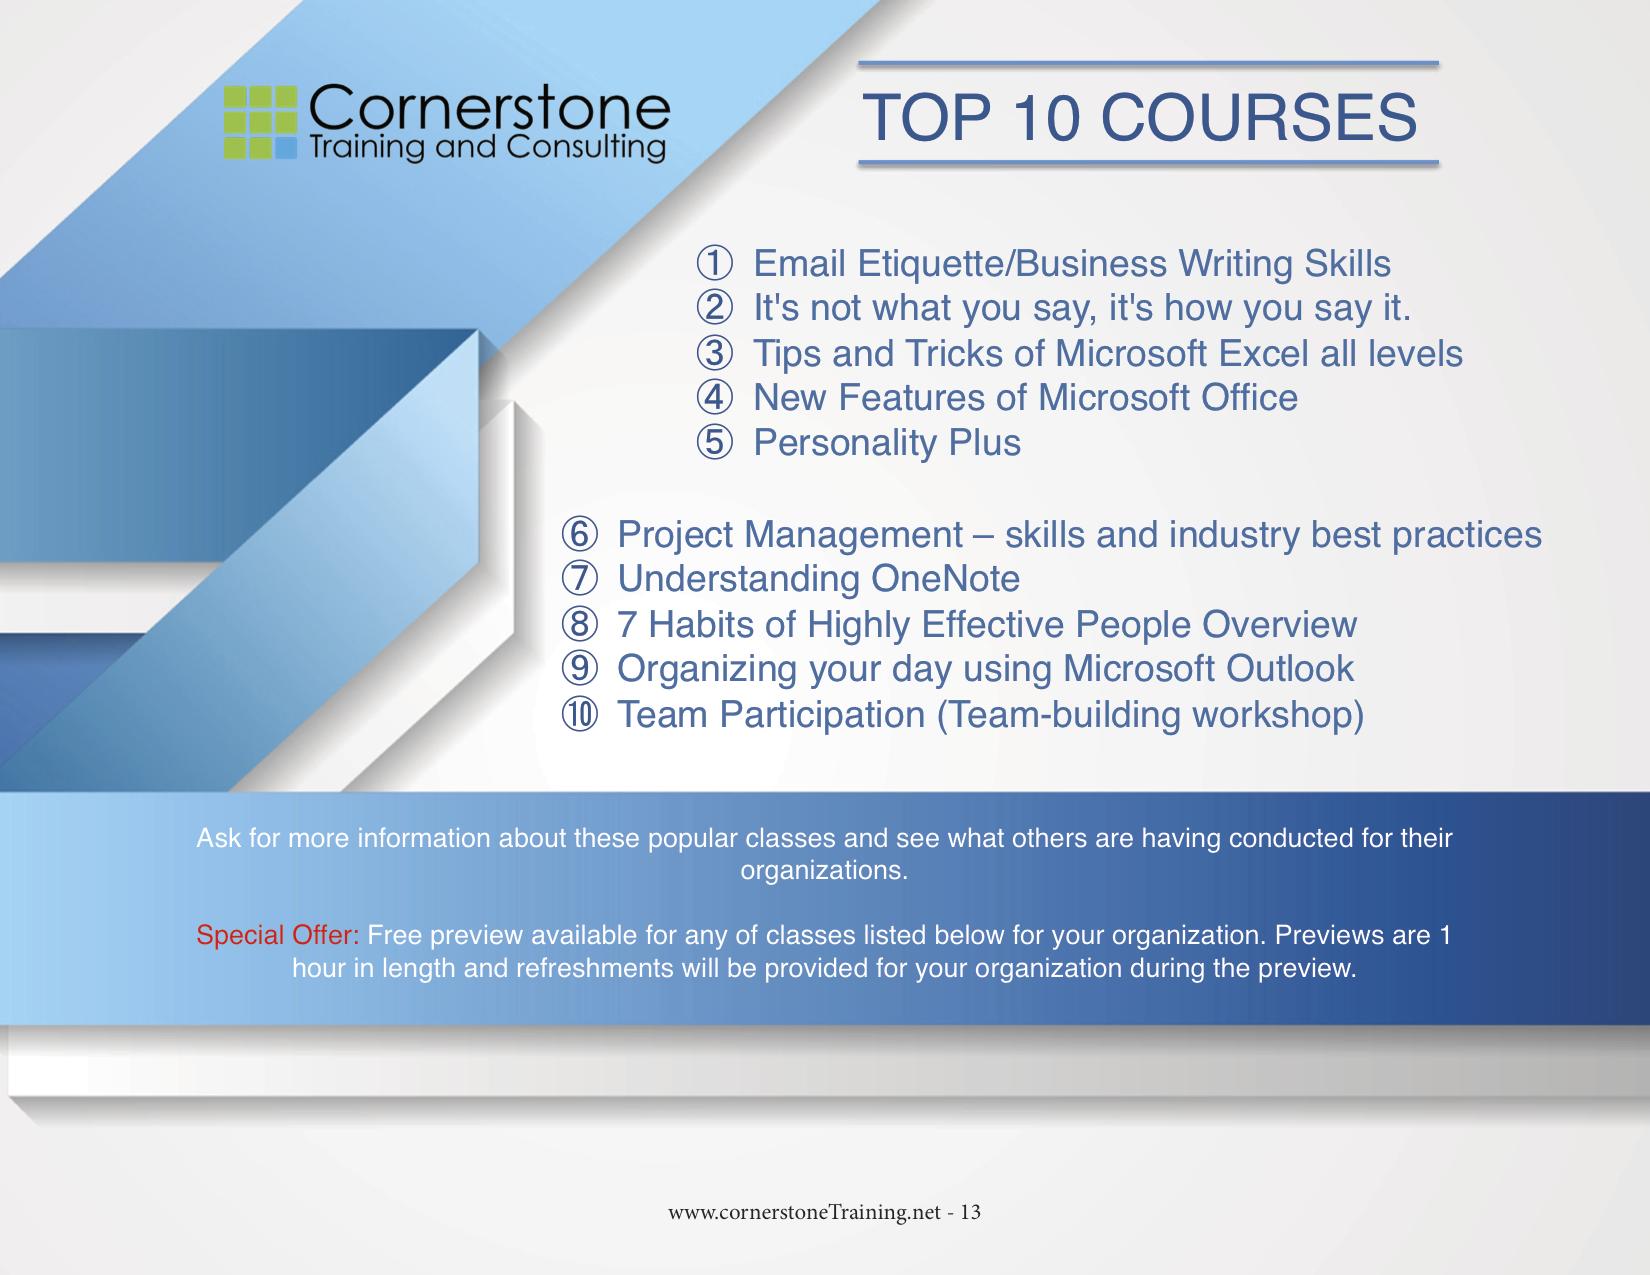 Cornerstone-Catalog-FINAL 13